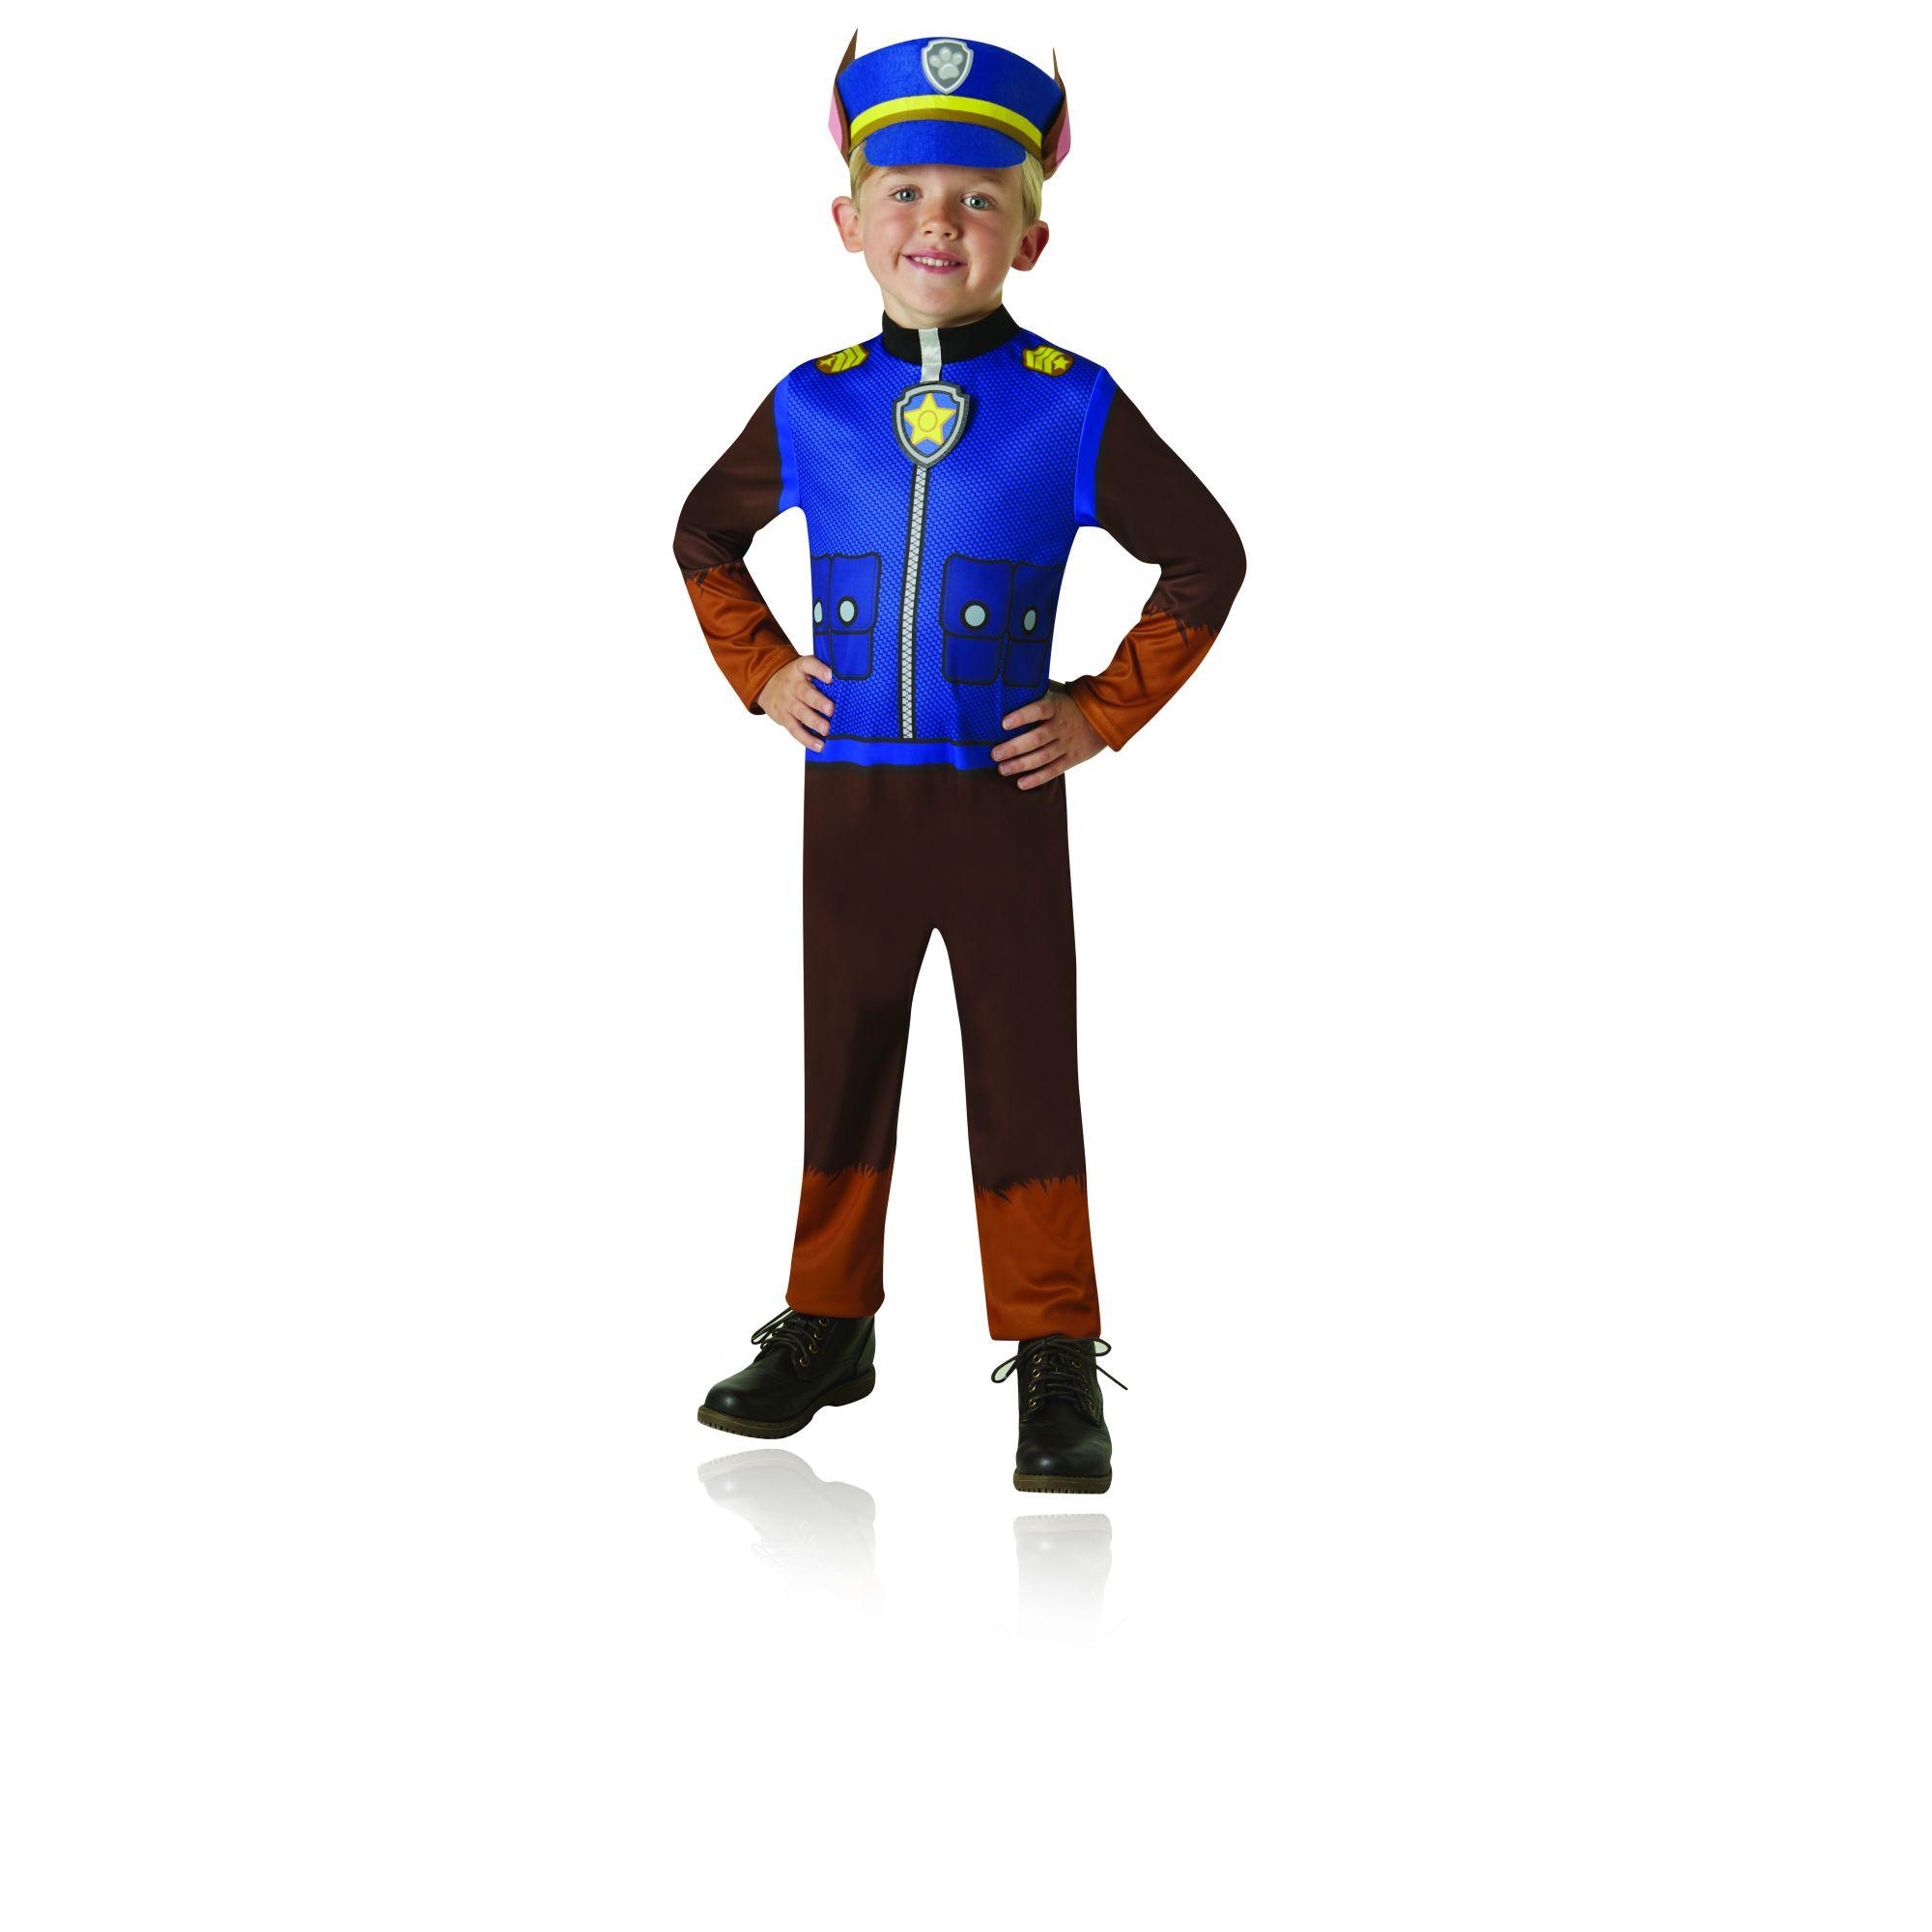 Costume Paw Patrol Chase bambino 2/3 anni